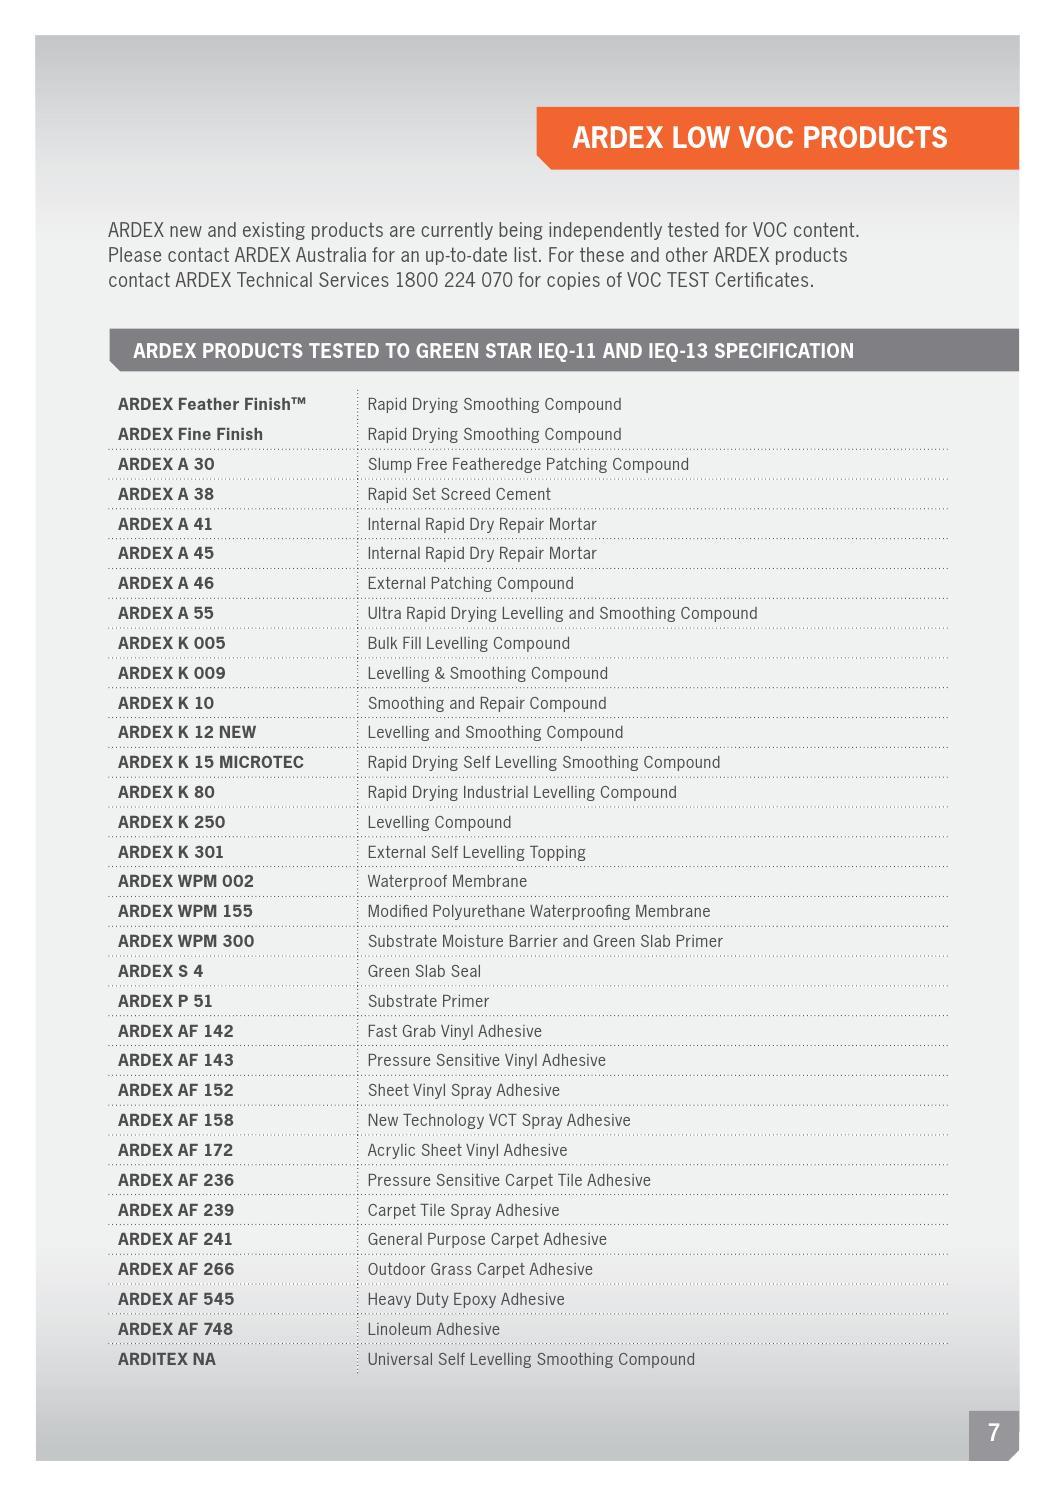 ARDEX 2013 Flooring Product Brochure by ARDEX Australia - issuu